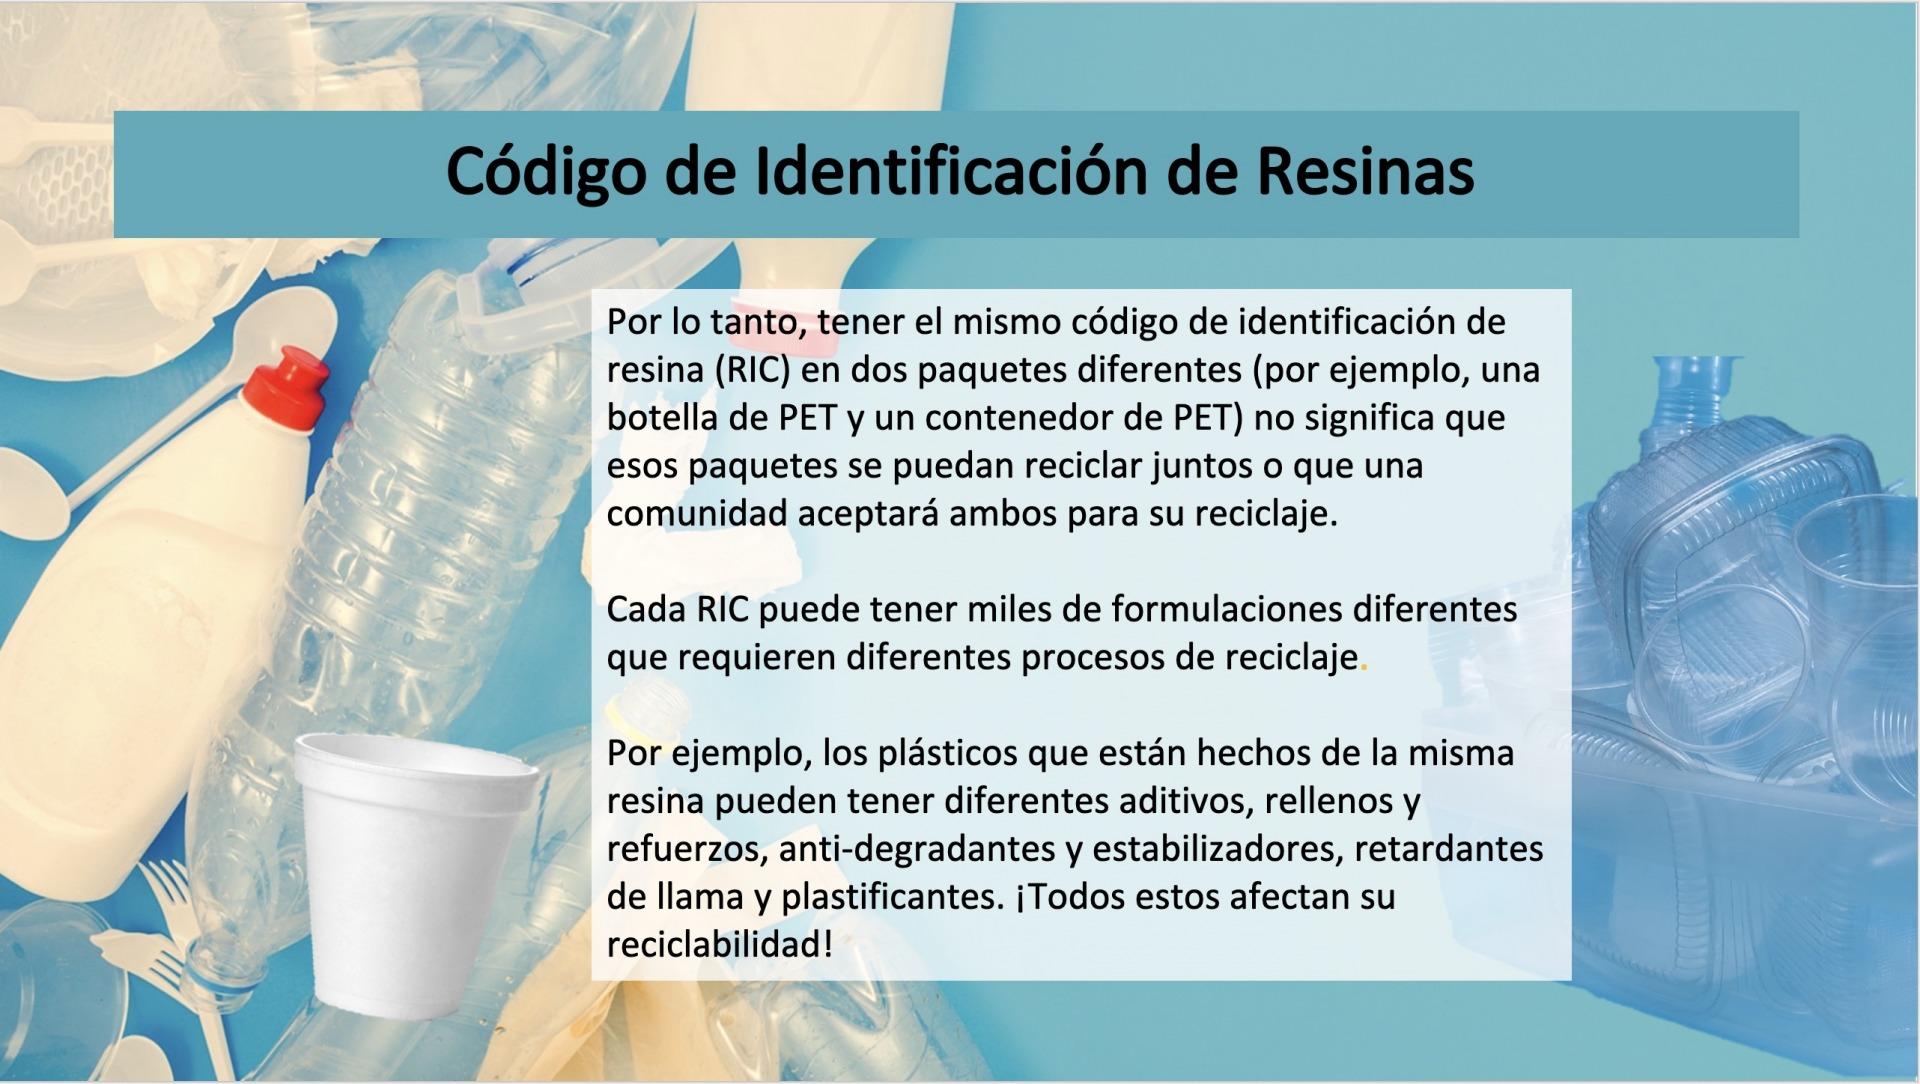 Código de Identificación de Resinas 6c